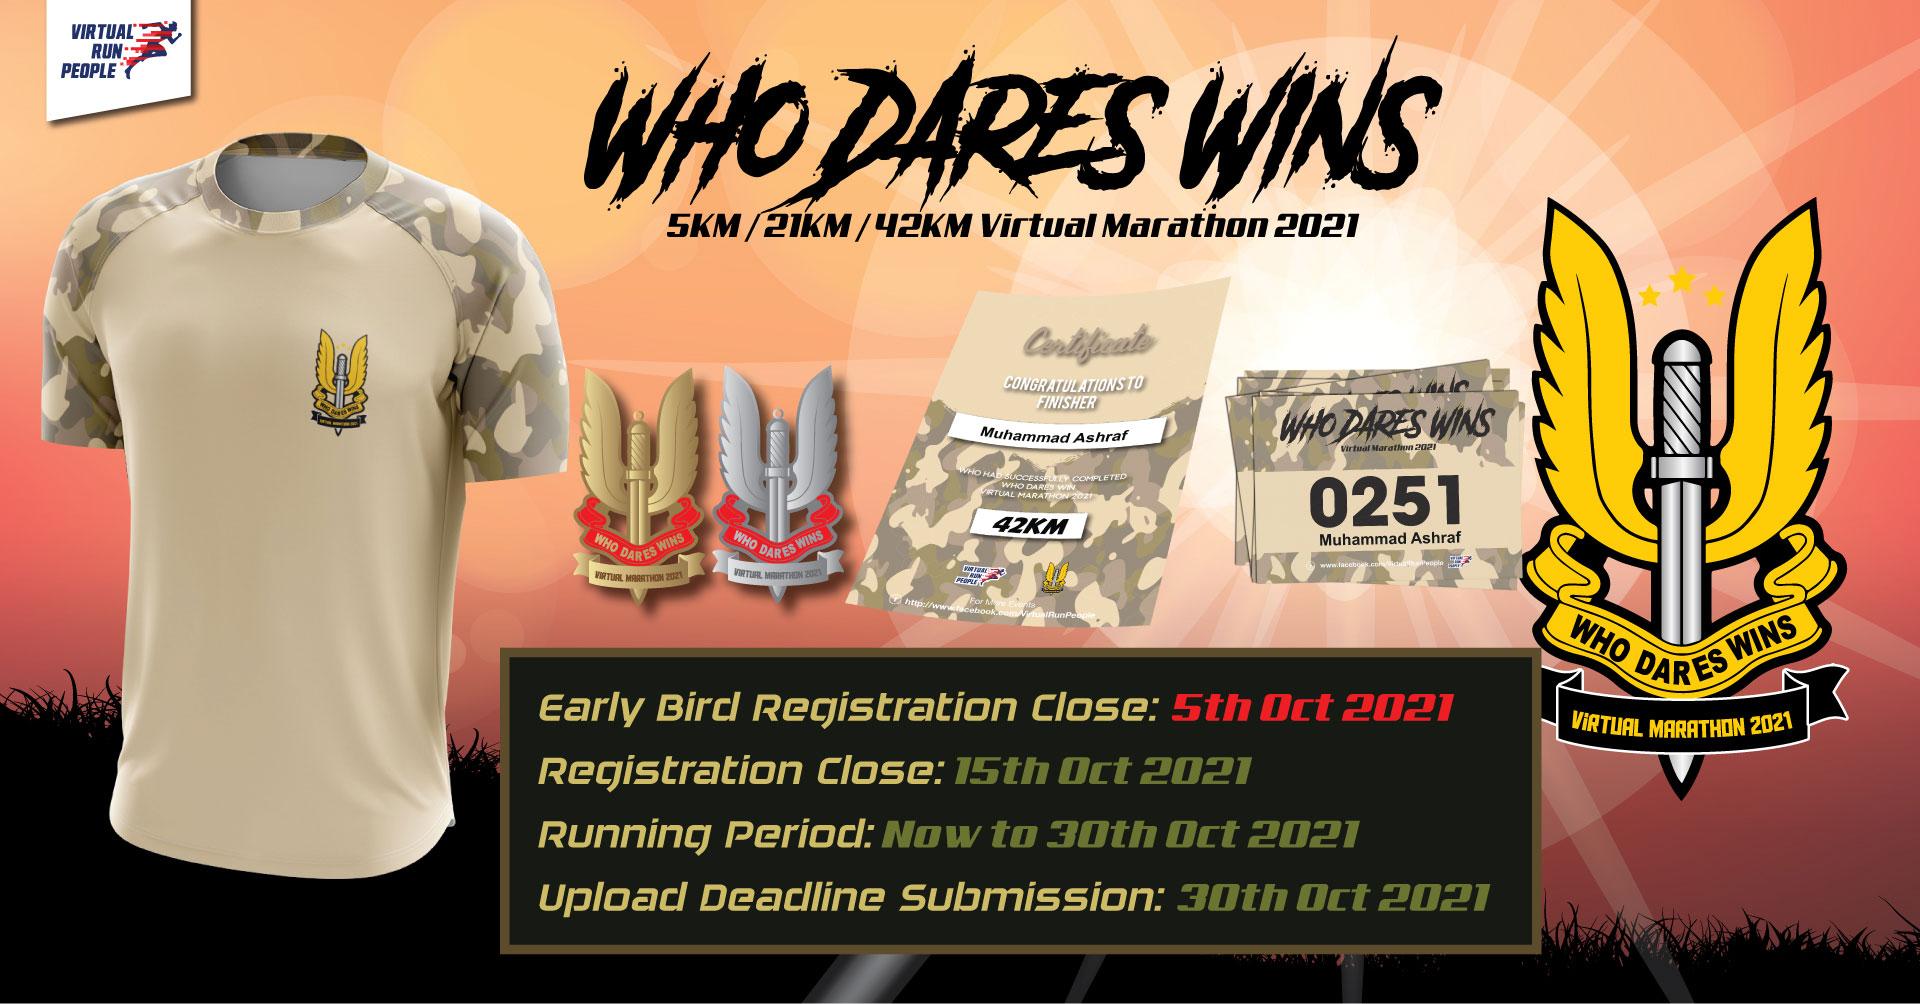 Logo of Who Dares Wins Virtual Marathon 2021